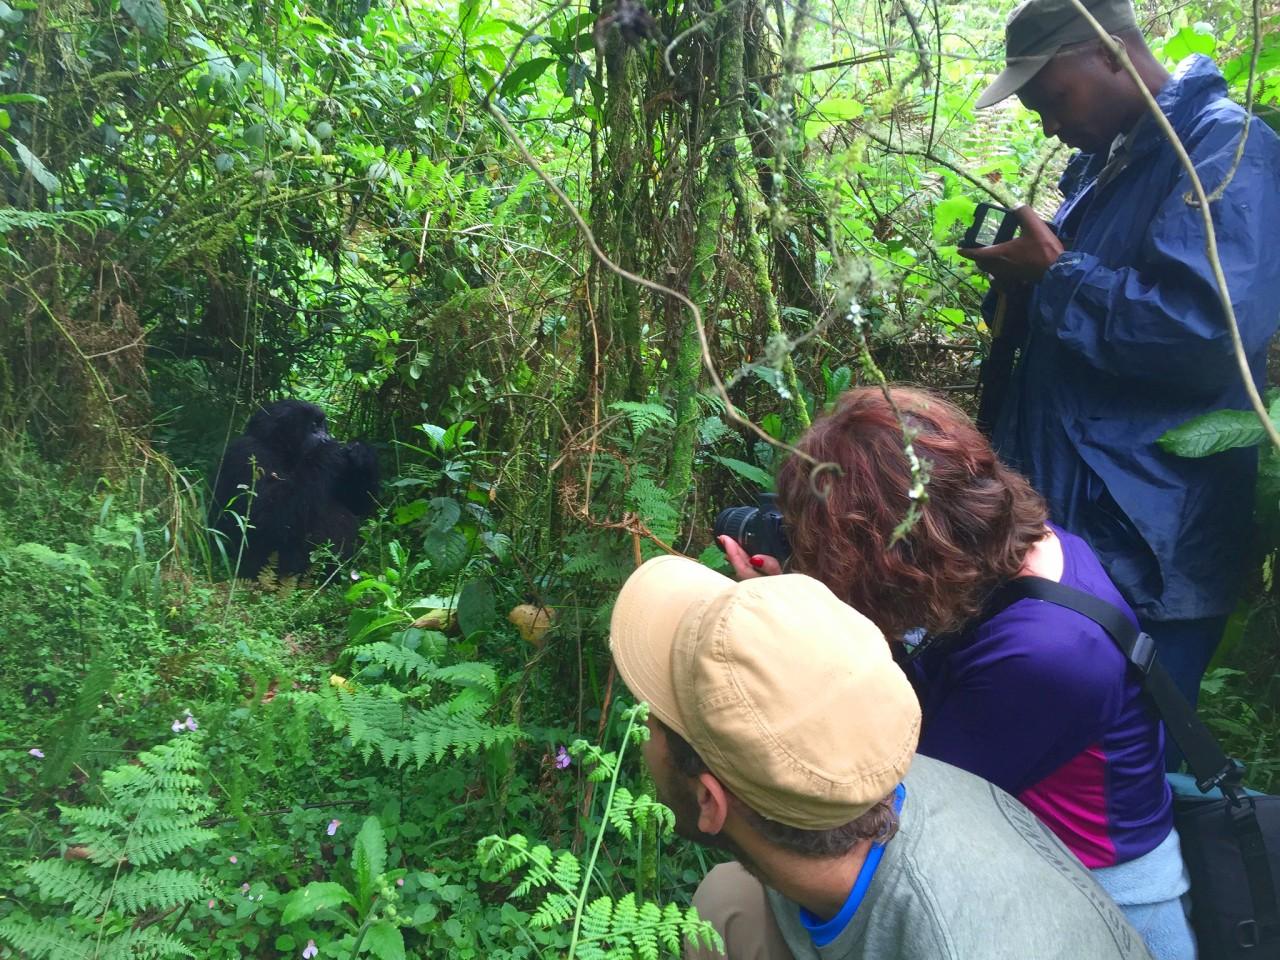 Rwanda safe for tourists?